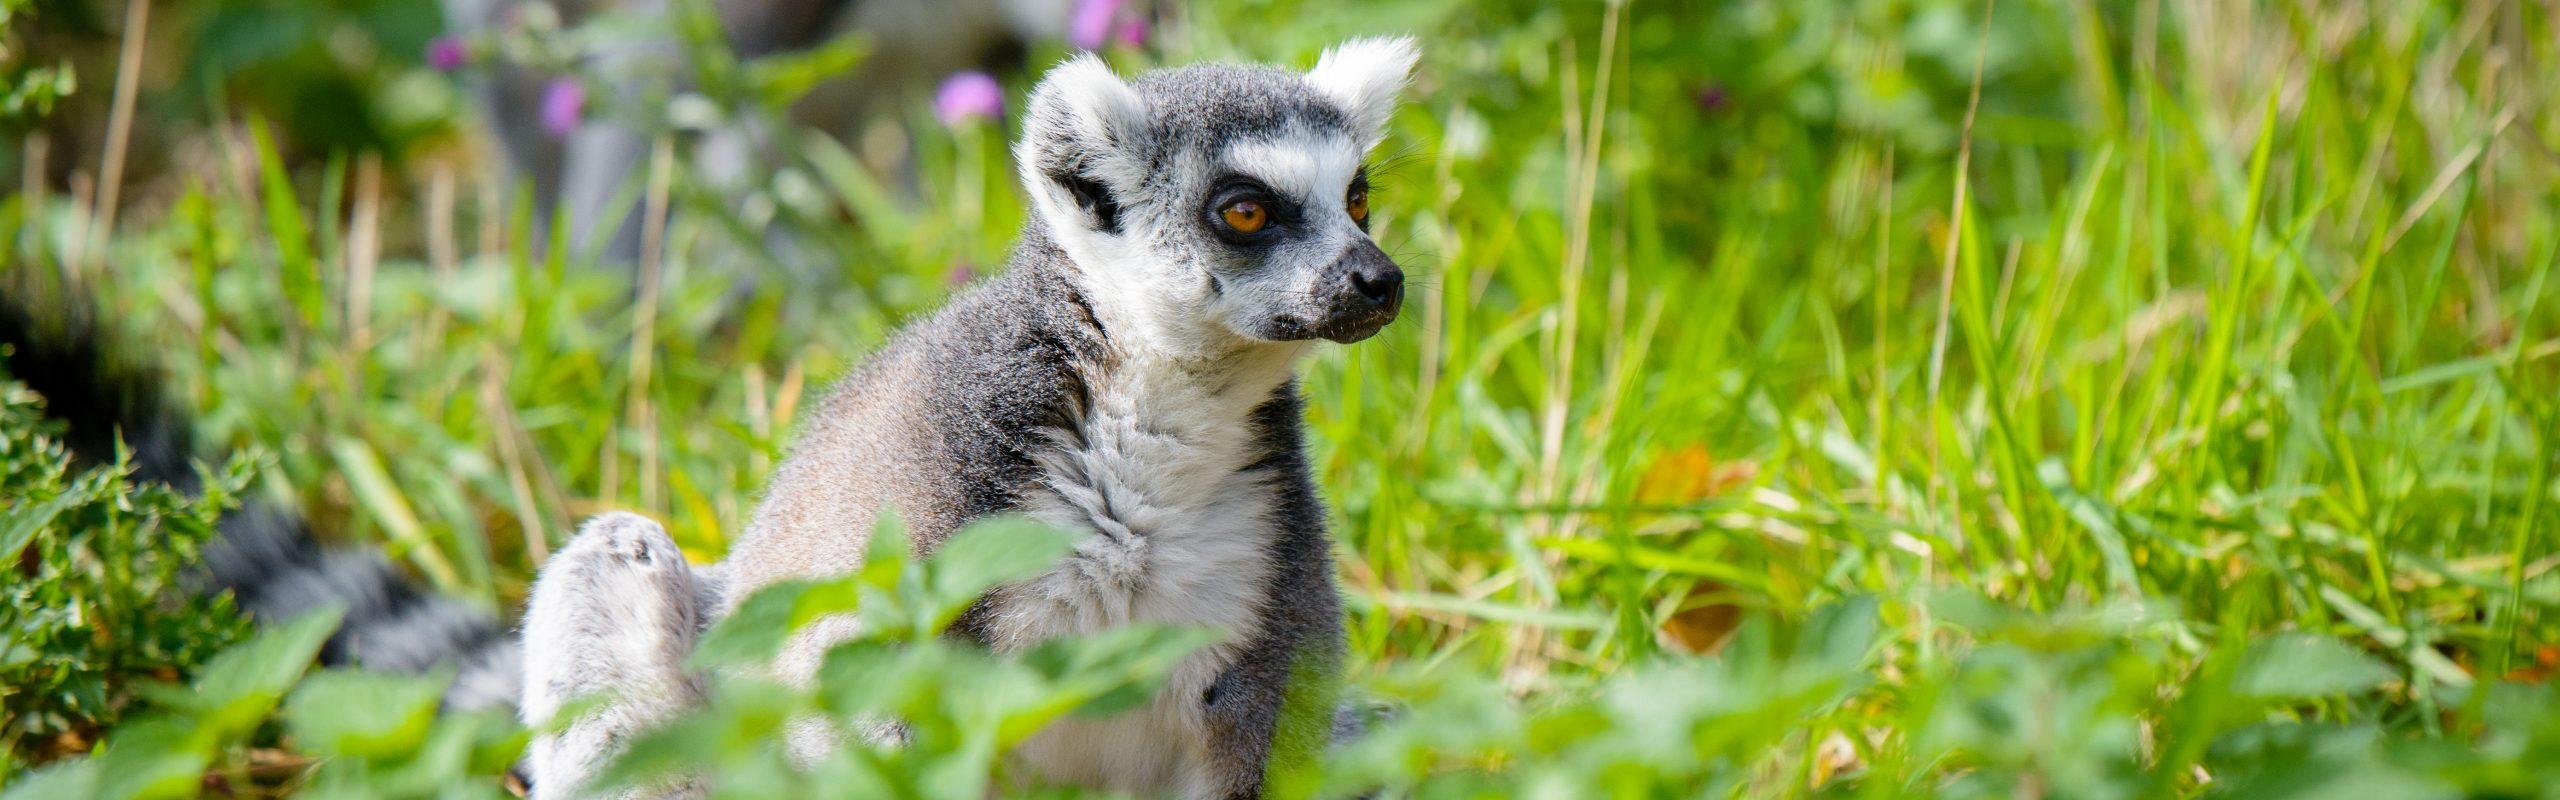 https://faunafocus.com/home/november-2018-ring-tailed-lemur/#jp-carousel-11922